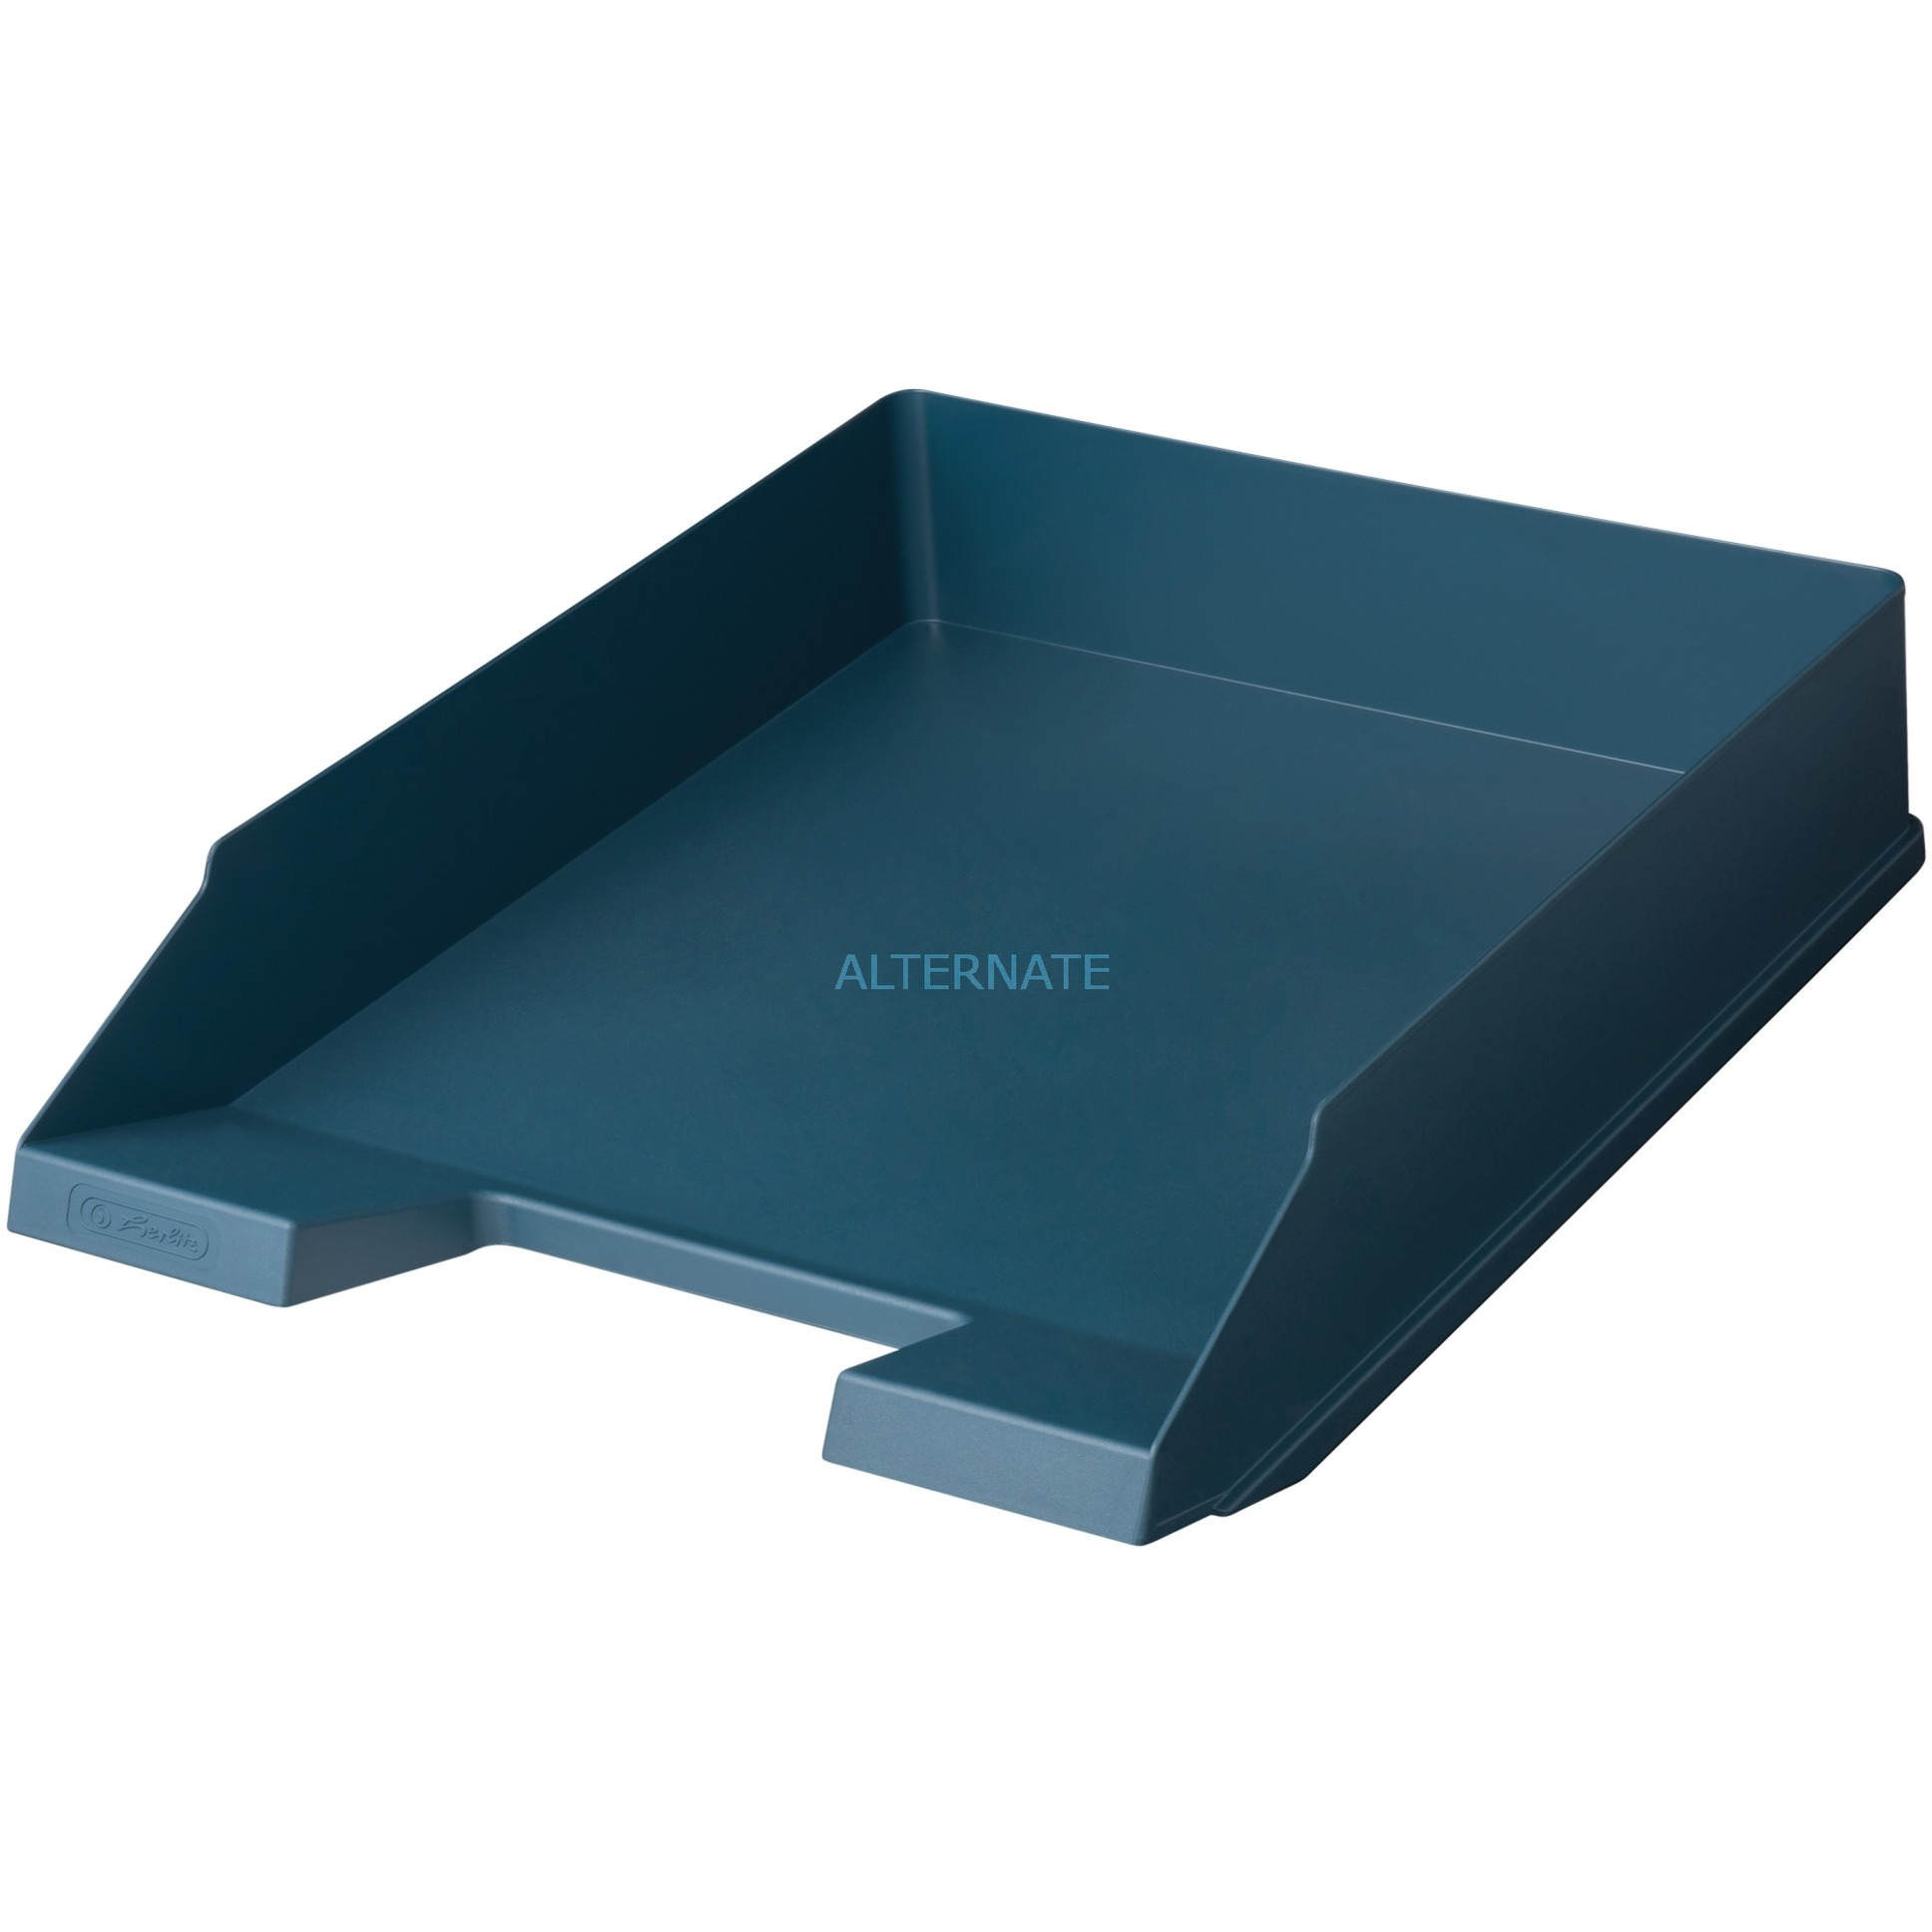 Image of Ablagekorb A4-C4 classic dunkelblau, Briefablage